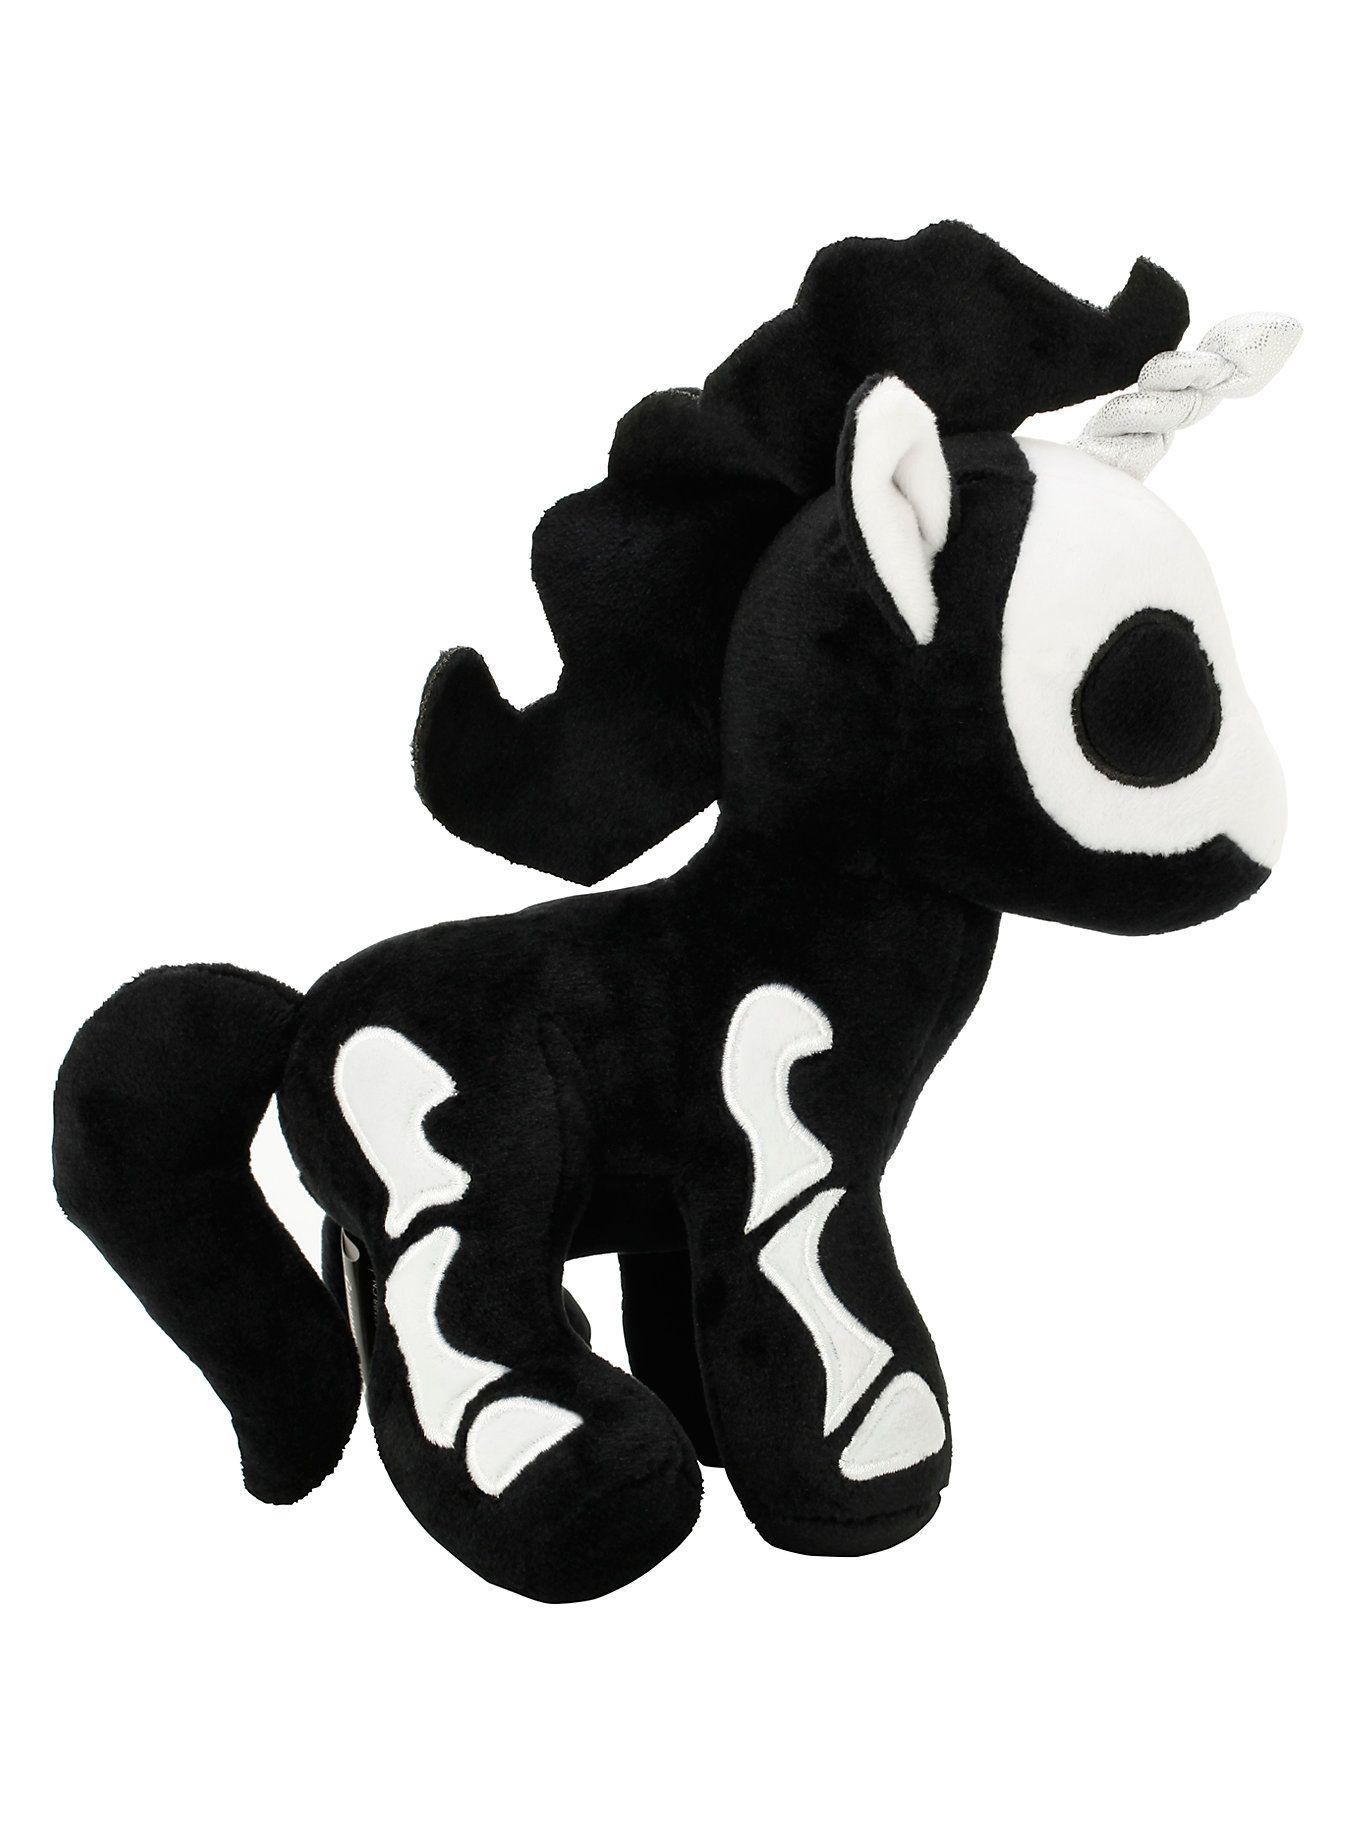 Skelanimals Bonita Plush | Dark home decor | Cute toys